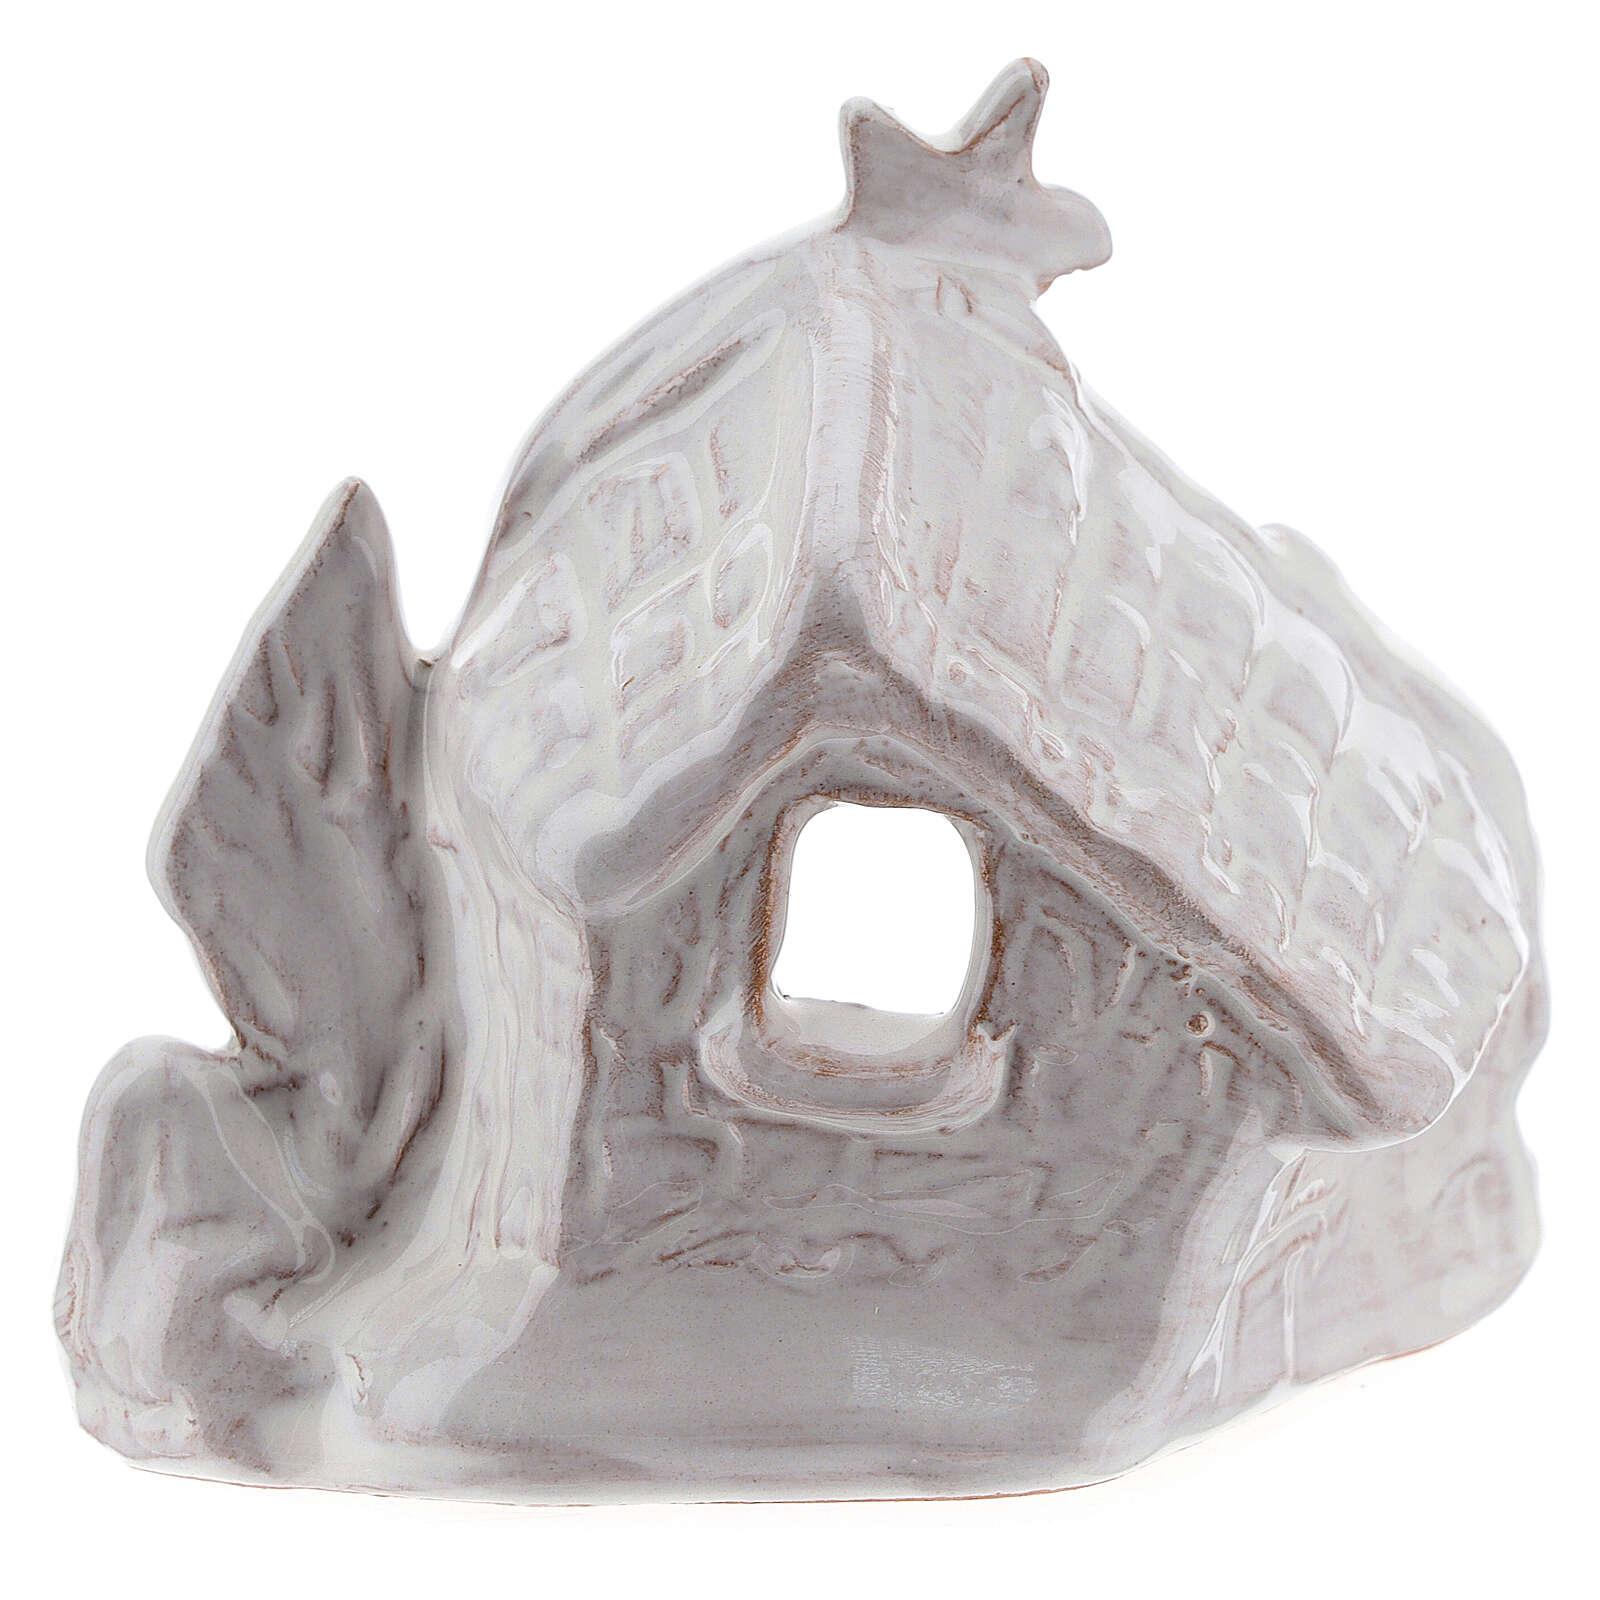 Cabaña Natividad cometa terracota blanca Deruta 8 cm 4